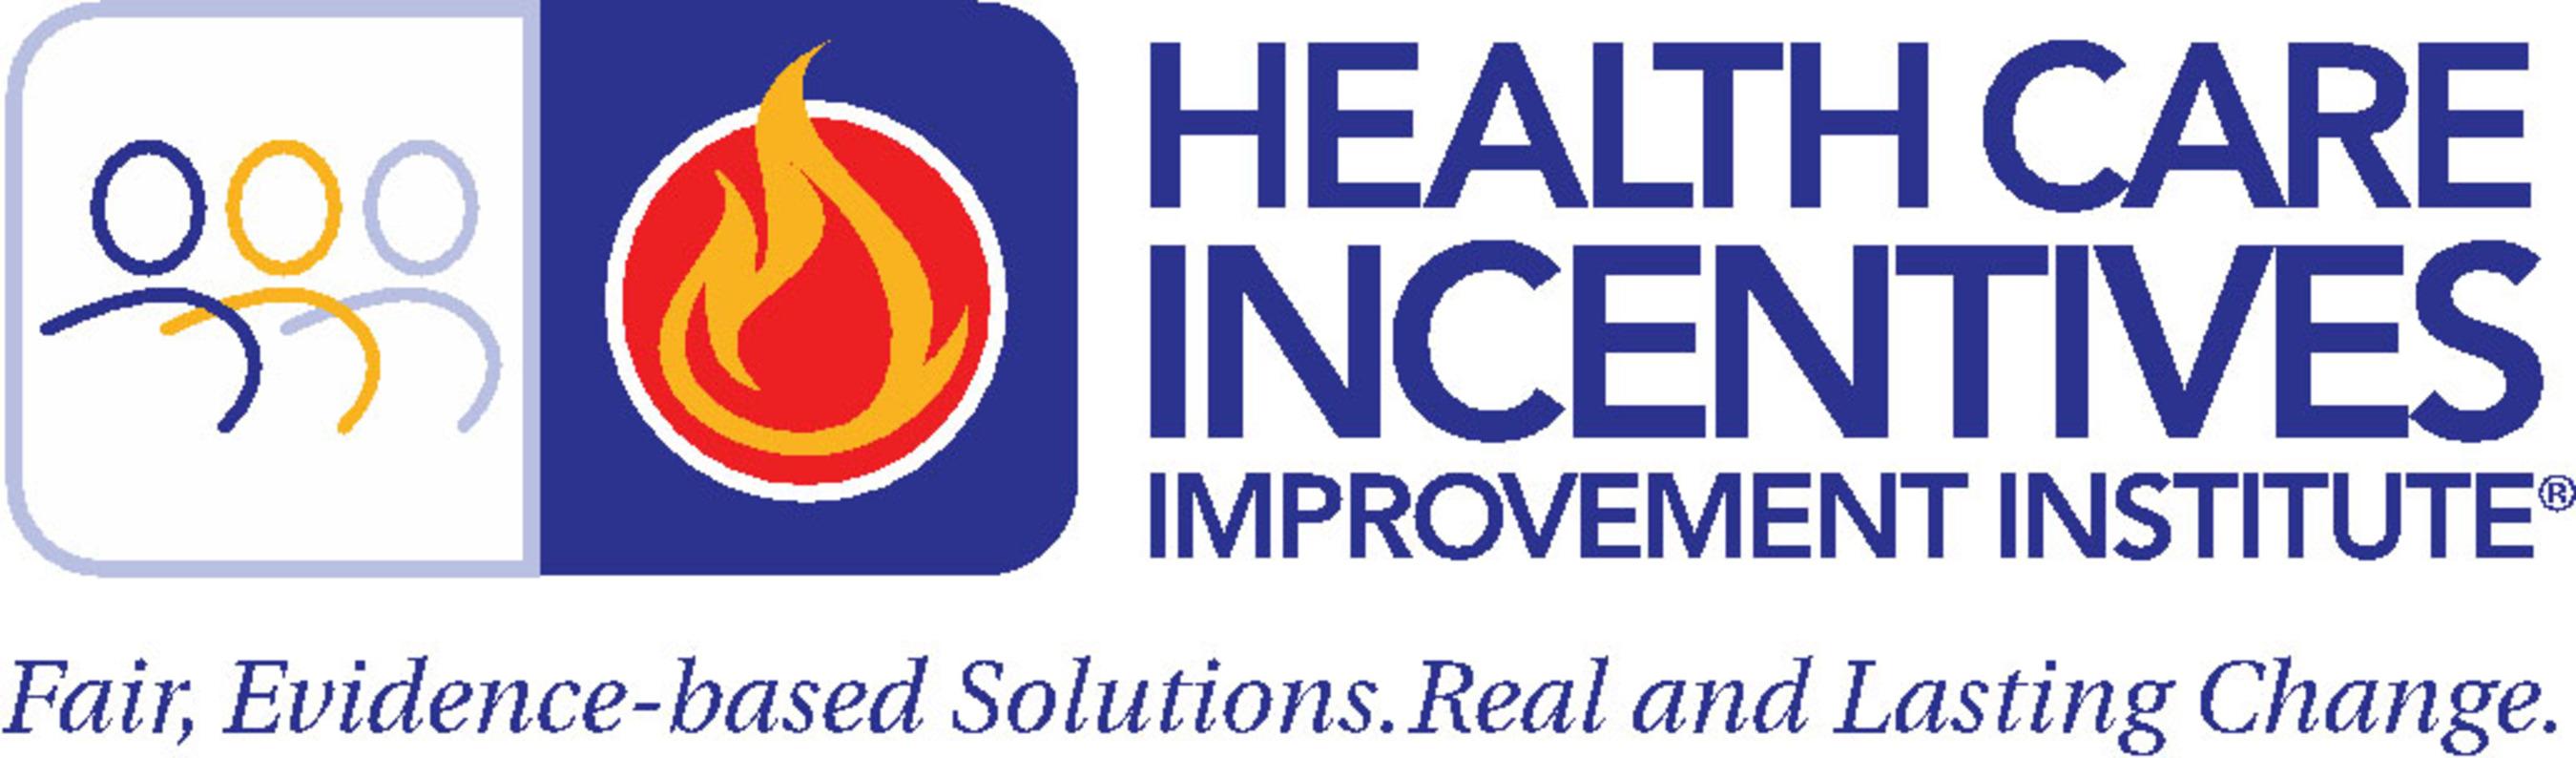 Health Care Incentives Improvement Institute.